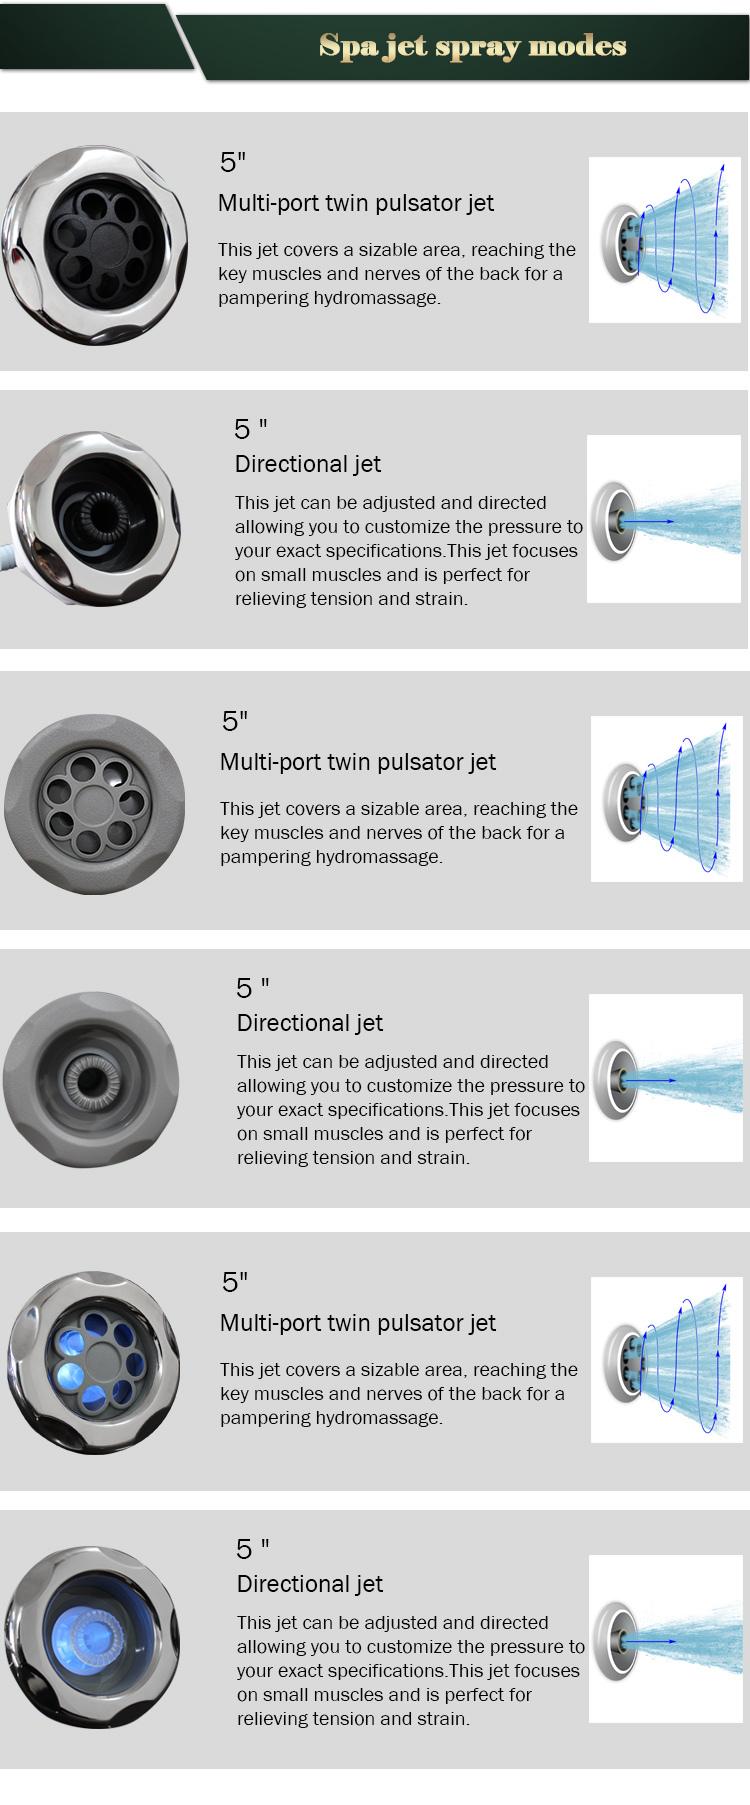 Water Jet Hydro Jet Spa Bathtub Parts Air Jets - Buy Hydro Jet Spa ...